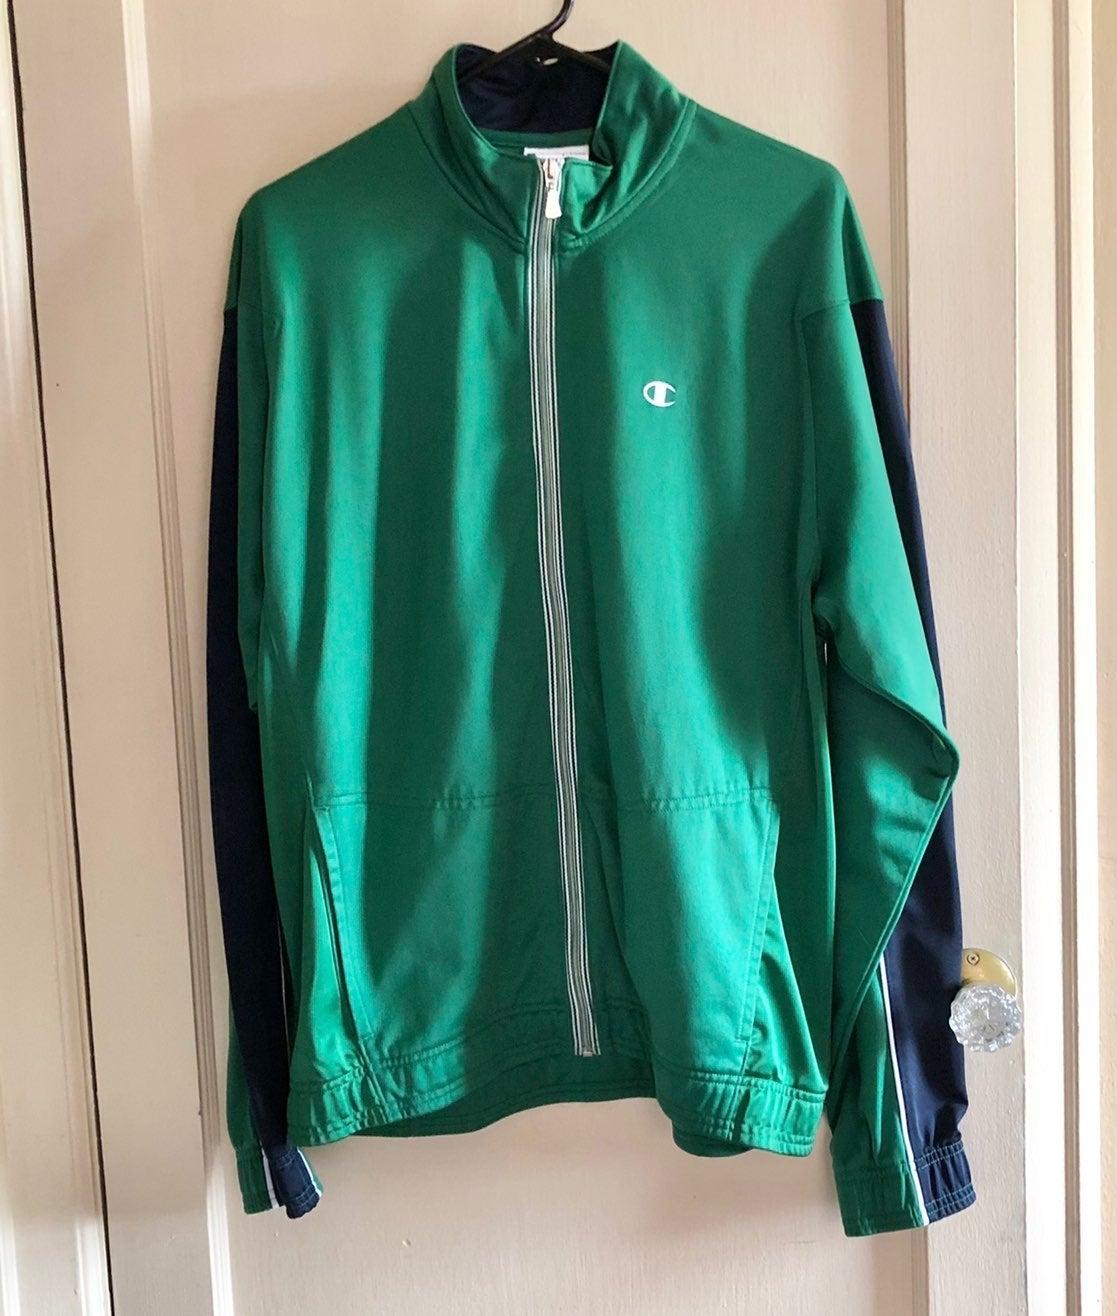 Champion Green Jacket Size Large